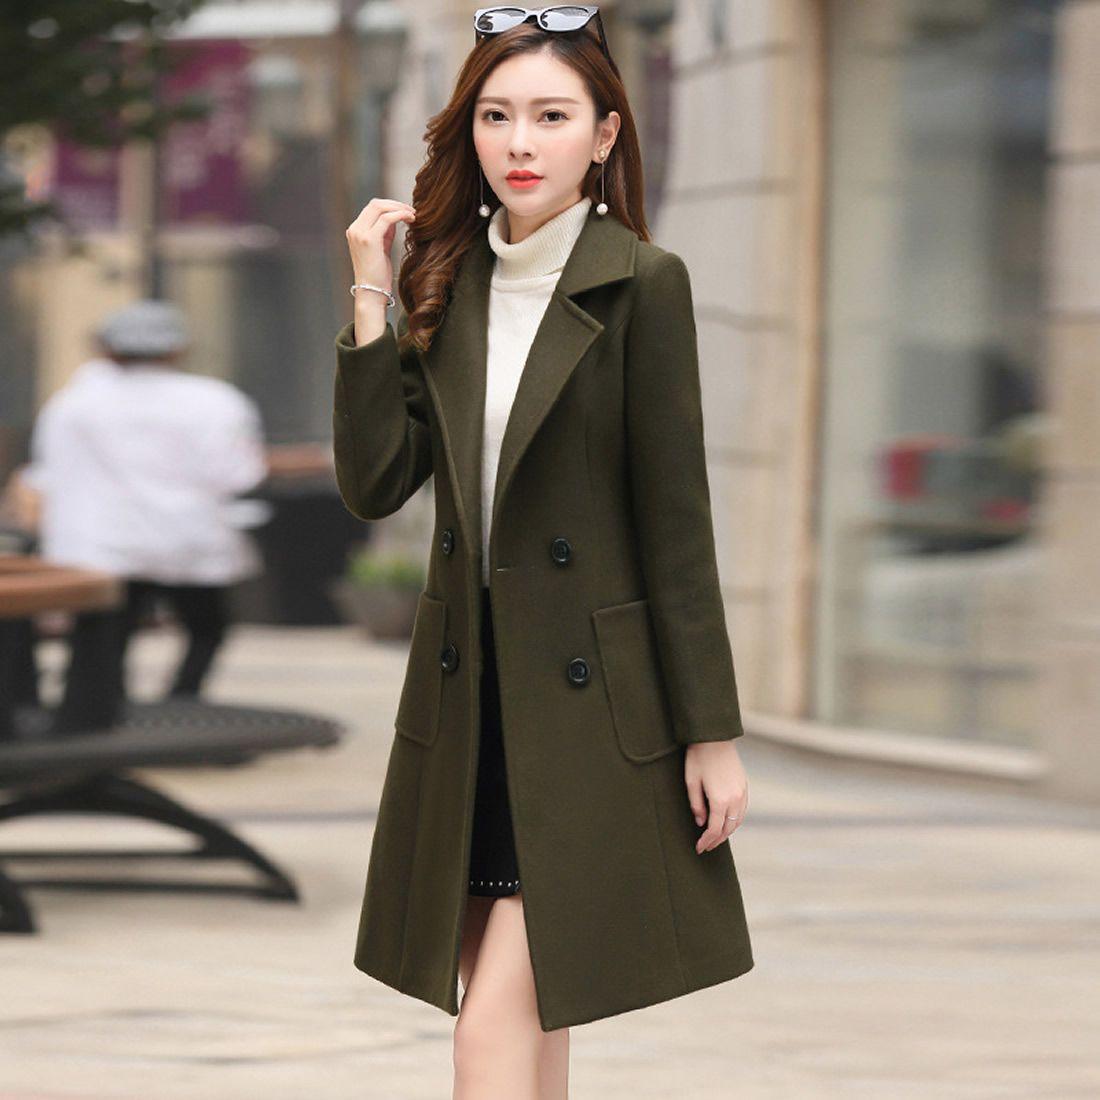 063fd2d77e39c7 Großhandel Herbst Winter Frau Wolle Mäntel 2018 Mode Casaco Feminino Frauen  Jacke Khaki Armee / Grün Plus Größe Outwear 3xl 4xl Mantel Von Meinuo110,  ...